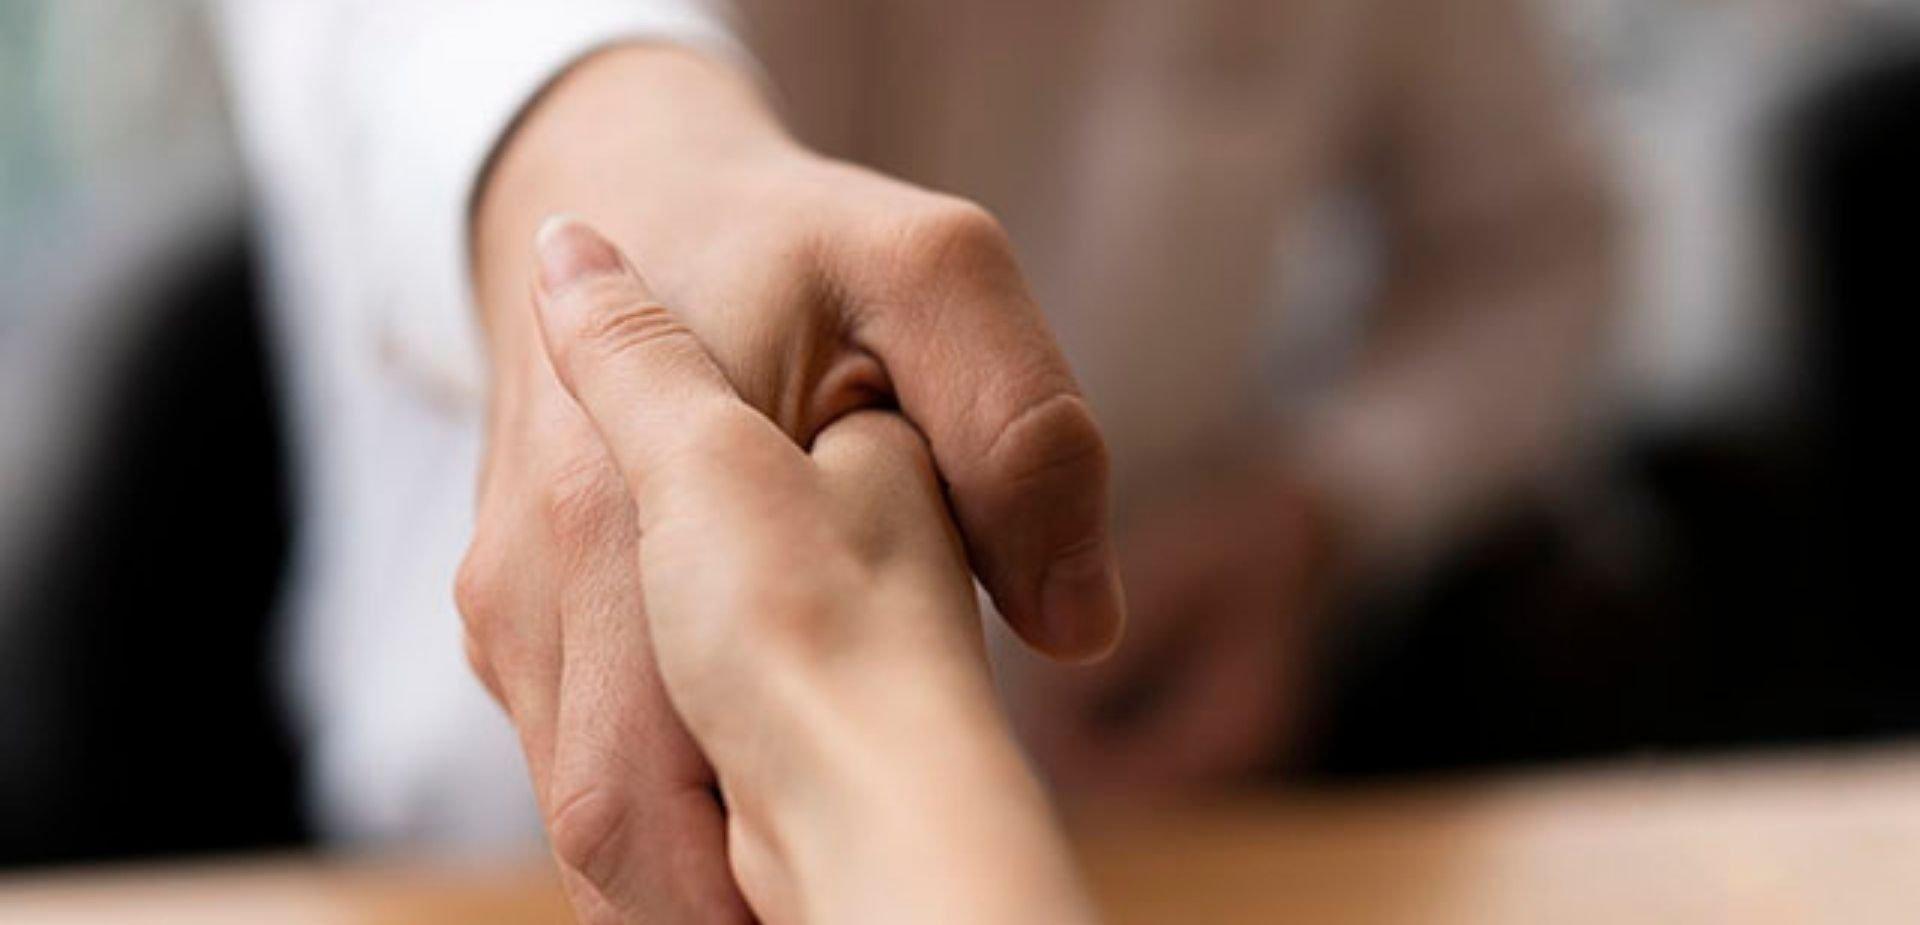 Oferta de emprego | Fisioterapeuta (Clínica EPISENSE - Matosinhos)